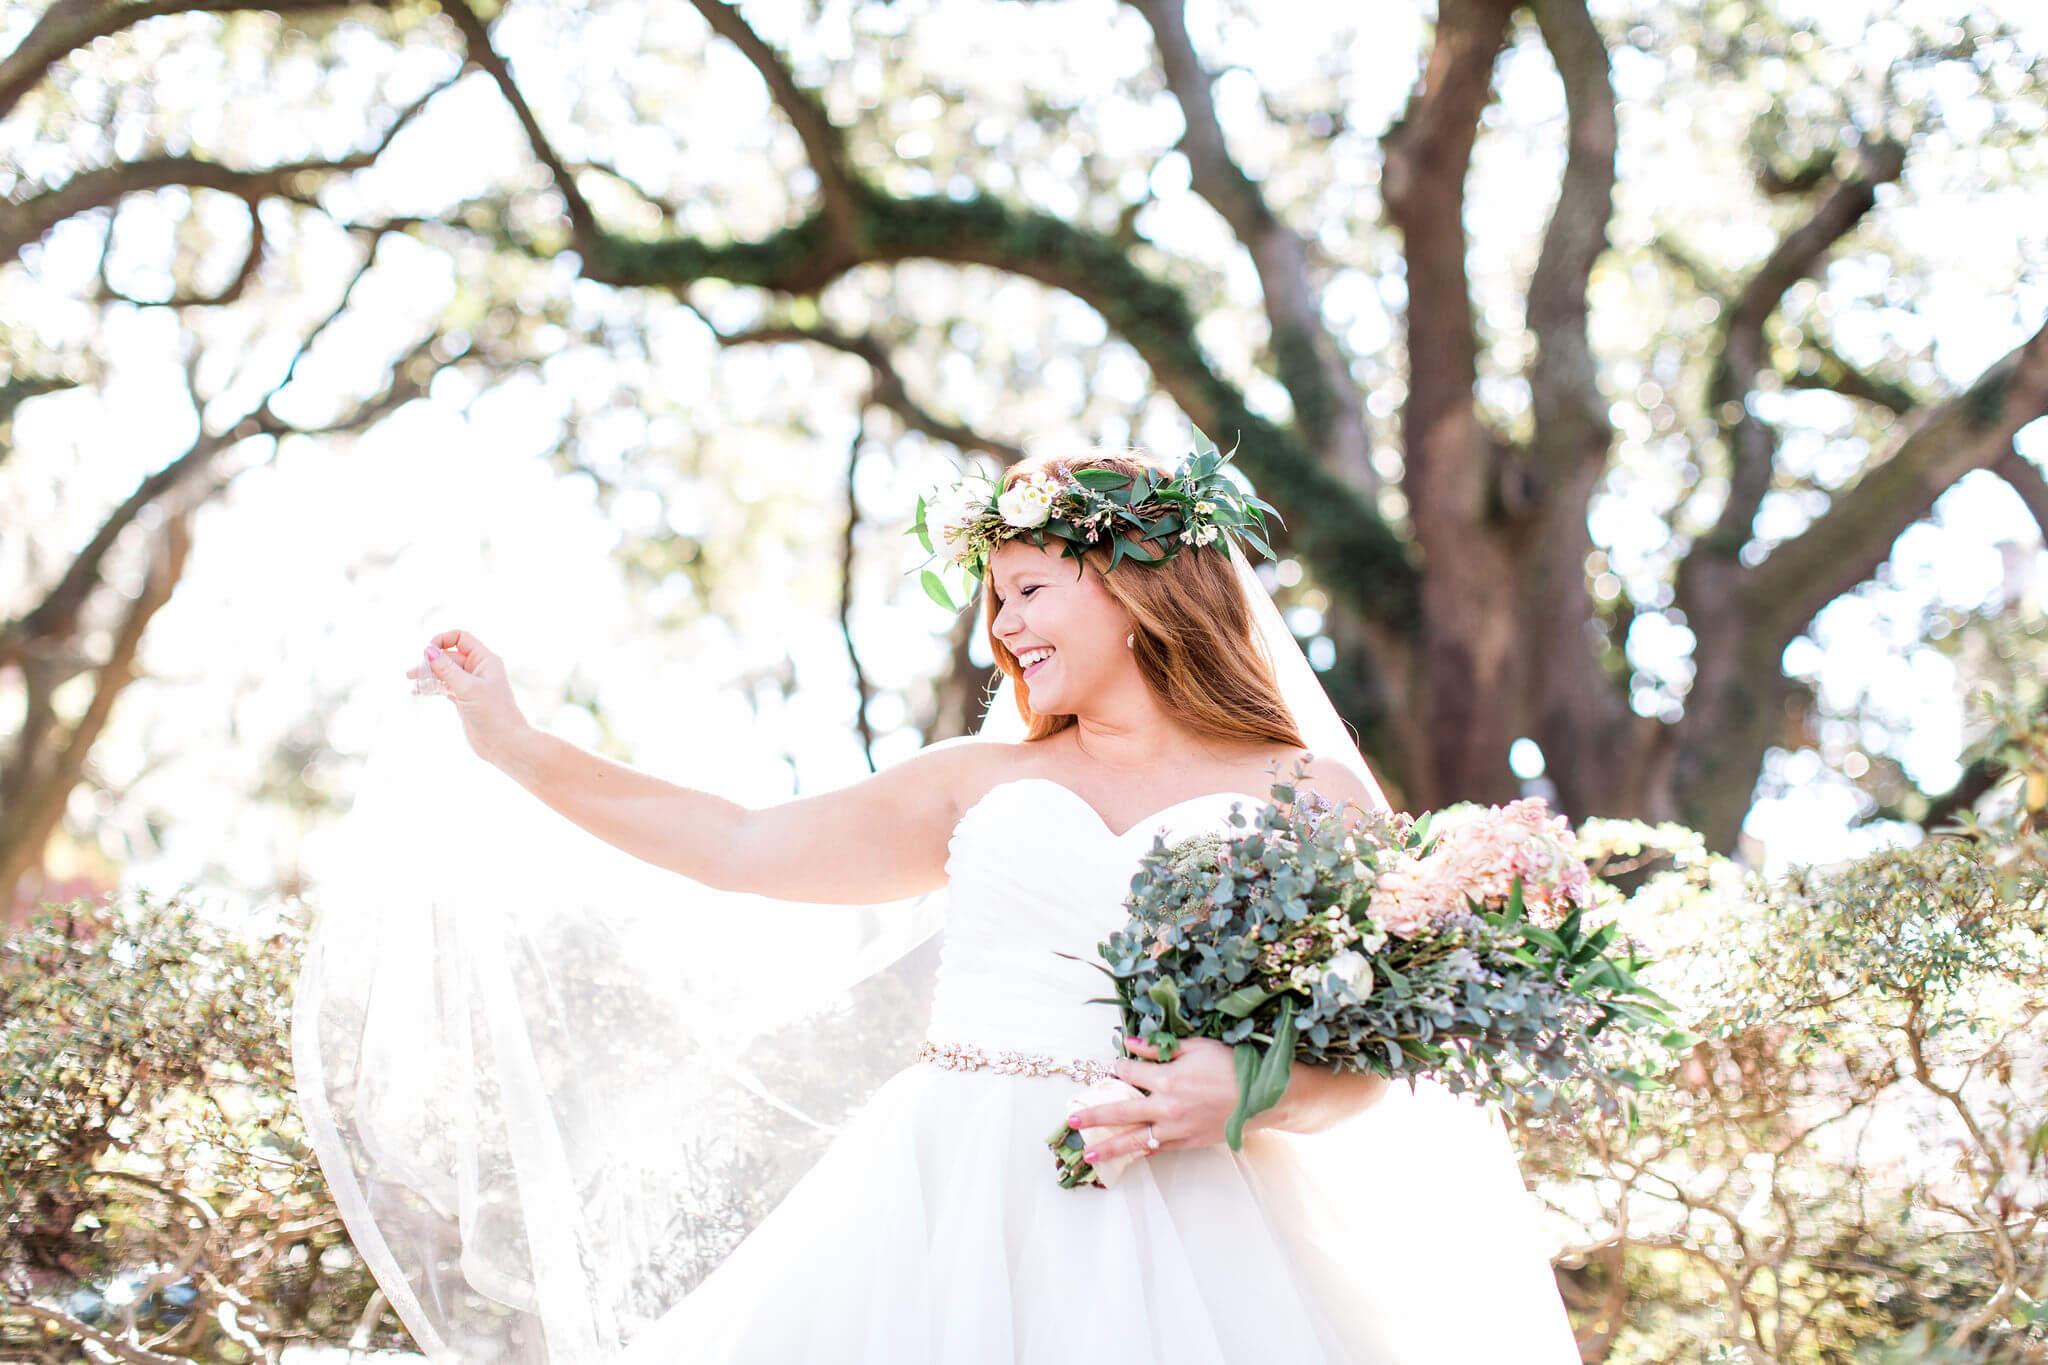 apt-b-photography-savannah-wedding-photographer-savannah-wedding-savannah-elopement-intimate-wedding-photographer-108.jpg